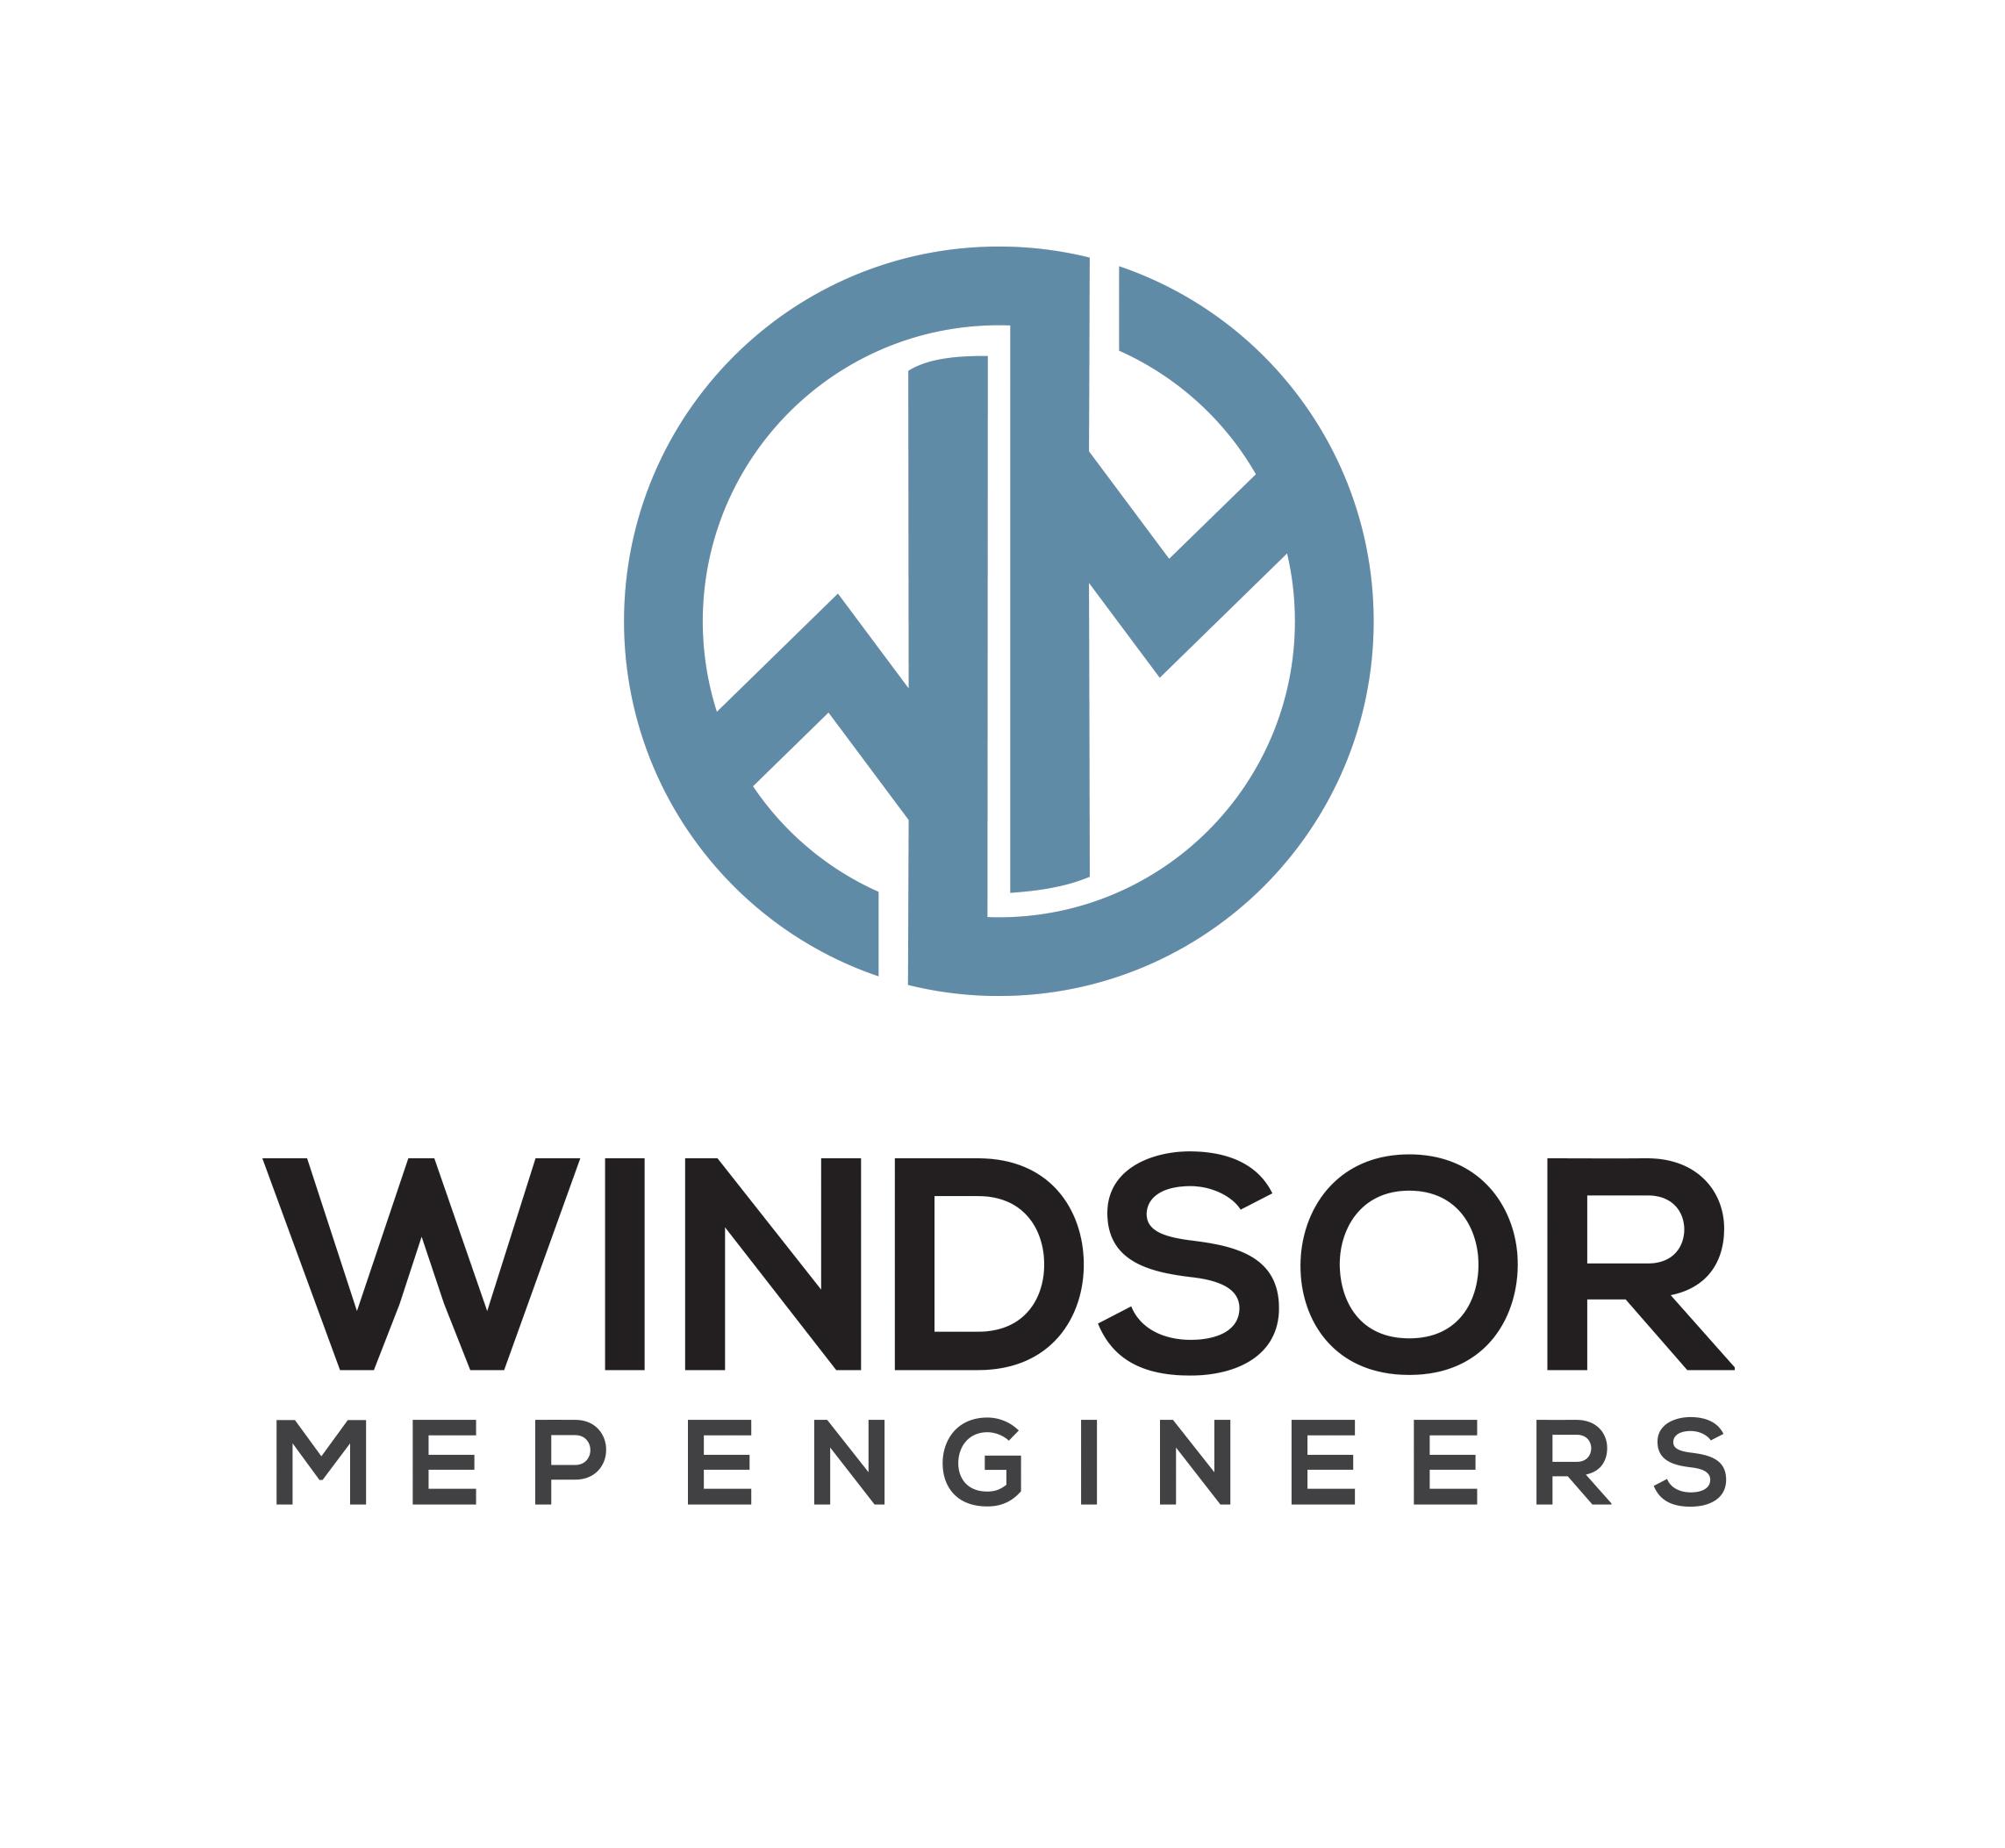 Windsor Engineers